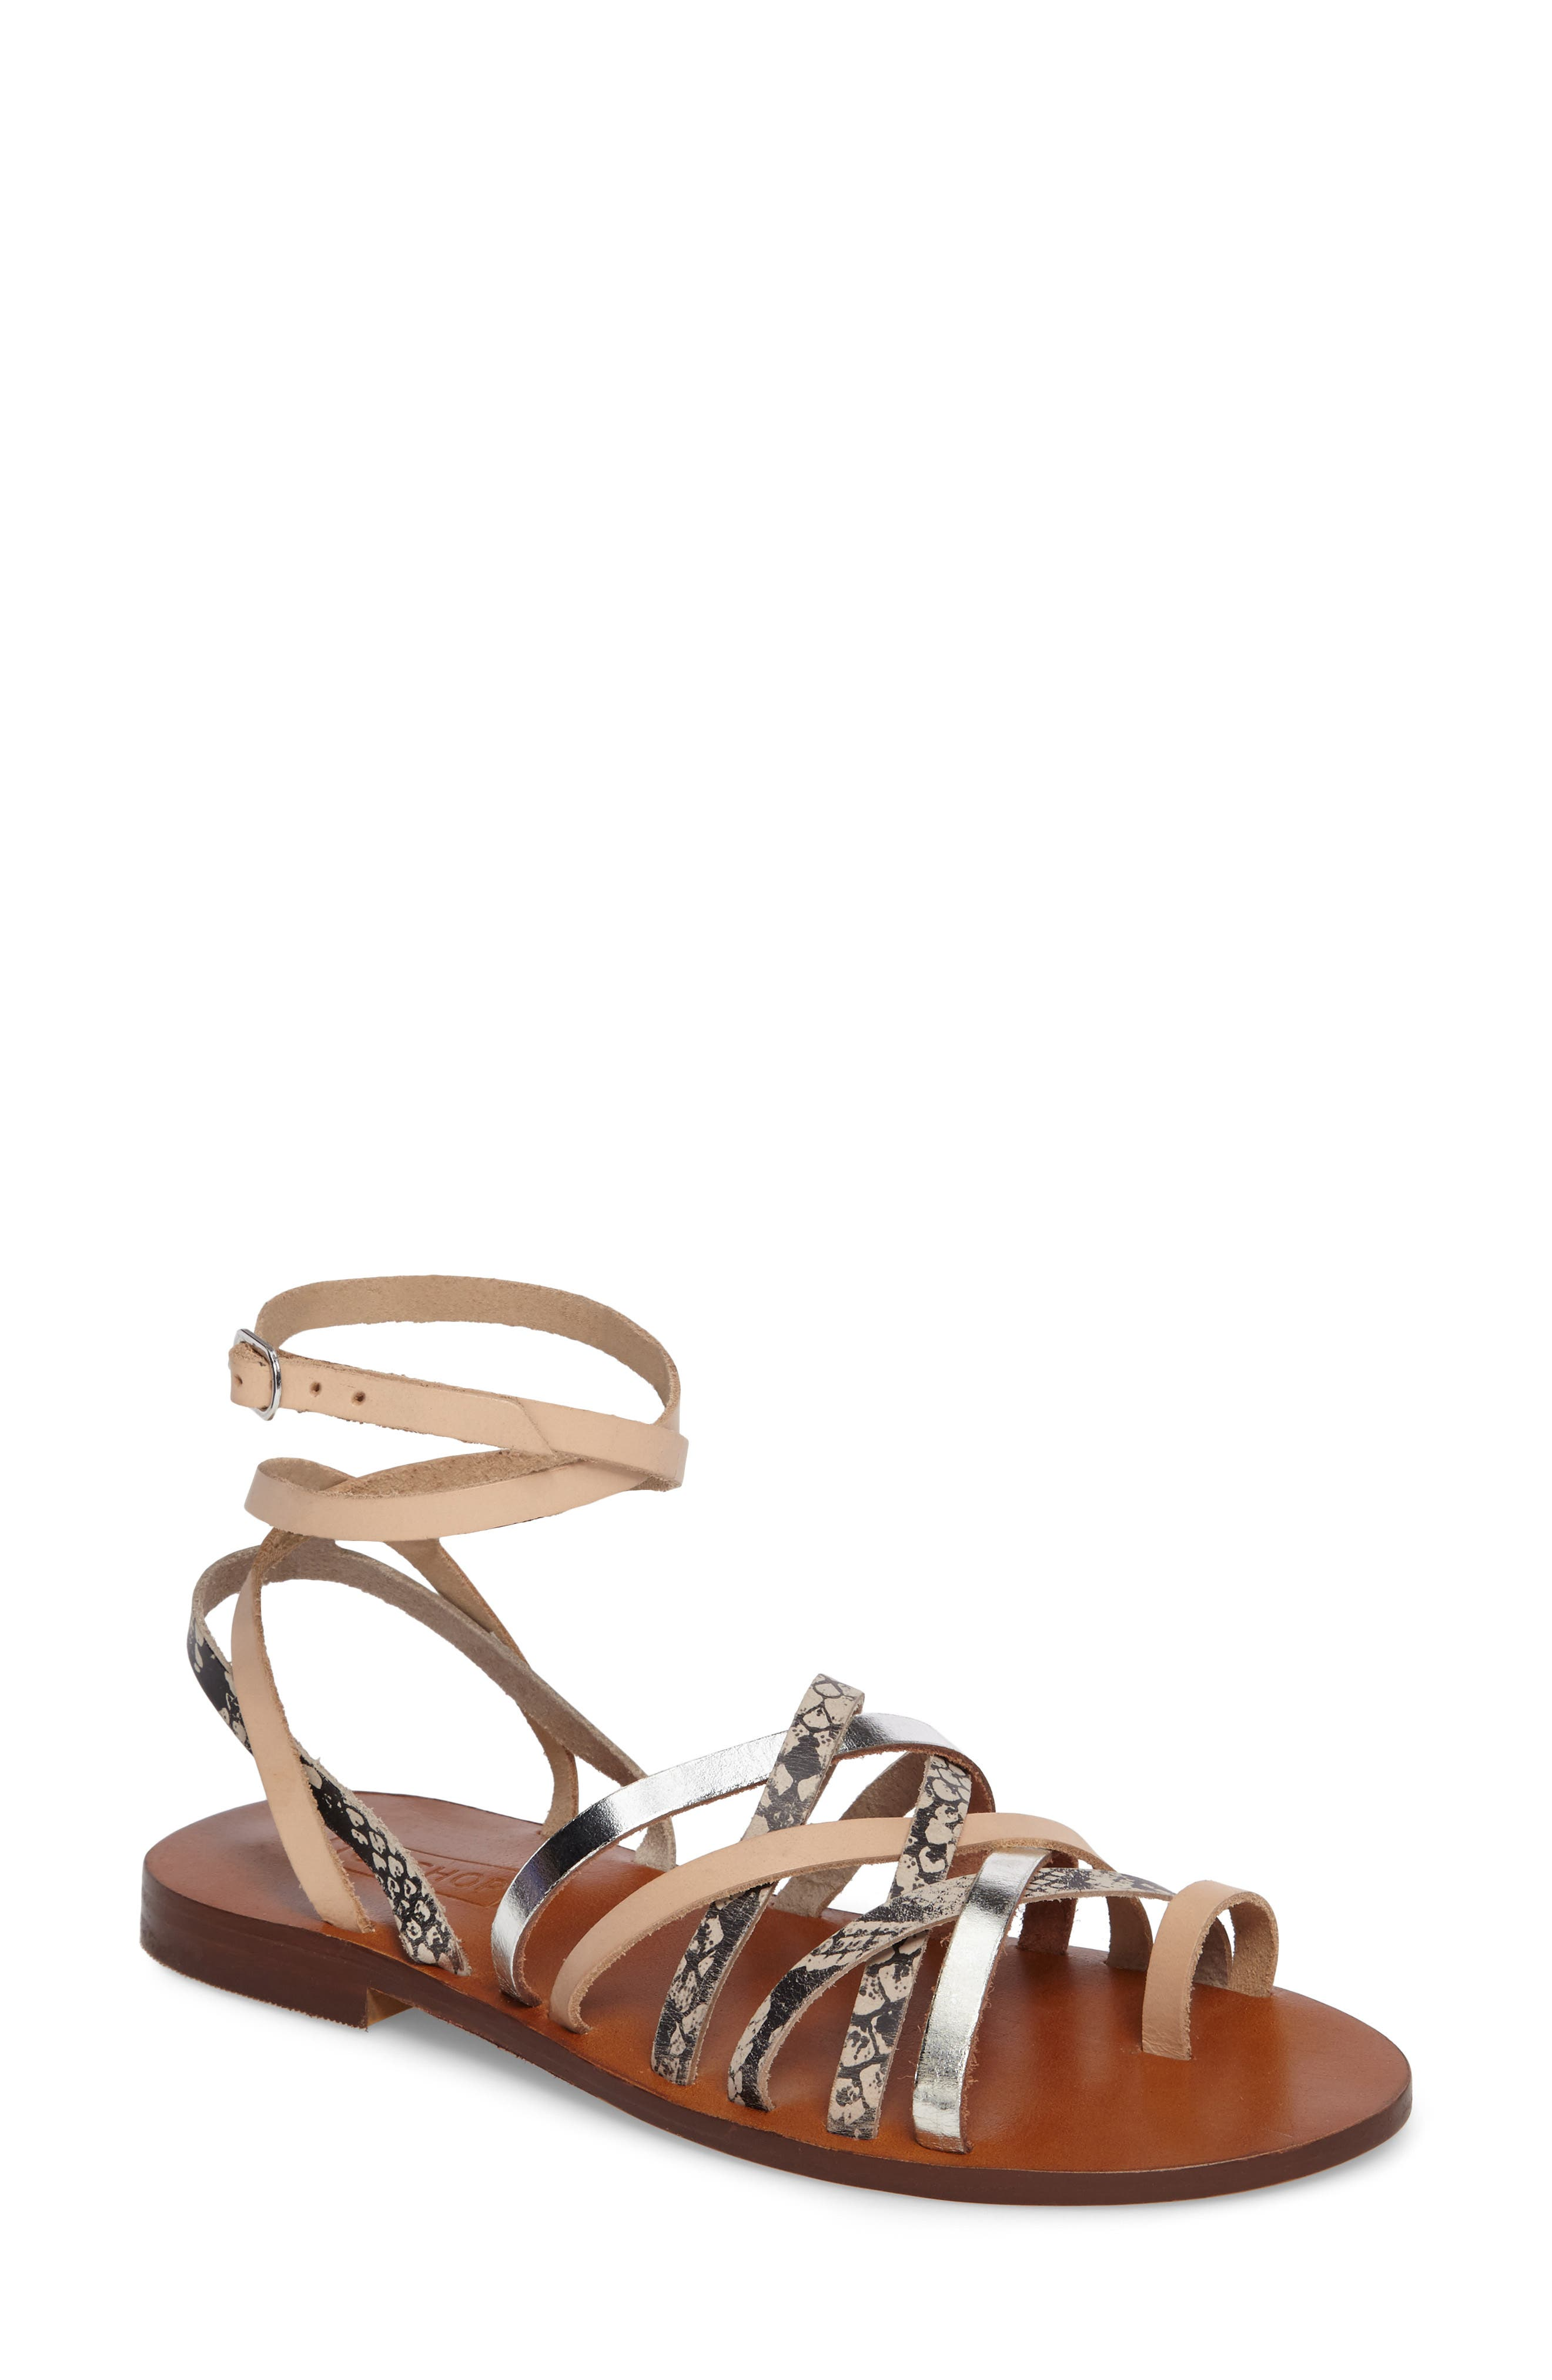 Main Image - Topshop Fizzy Strappy Sandal (Women)